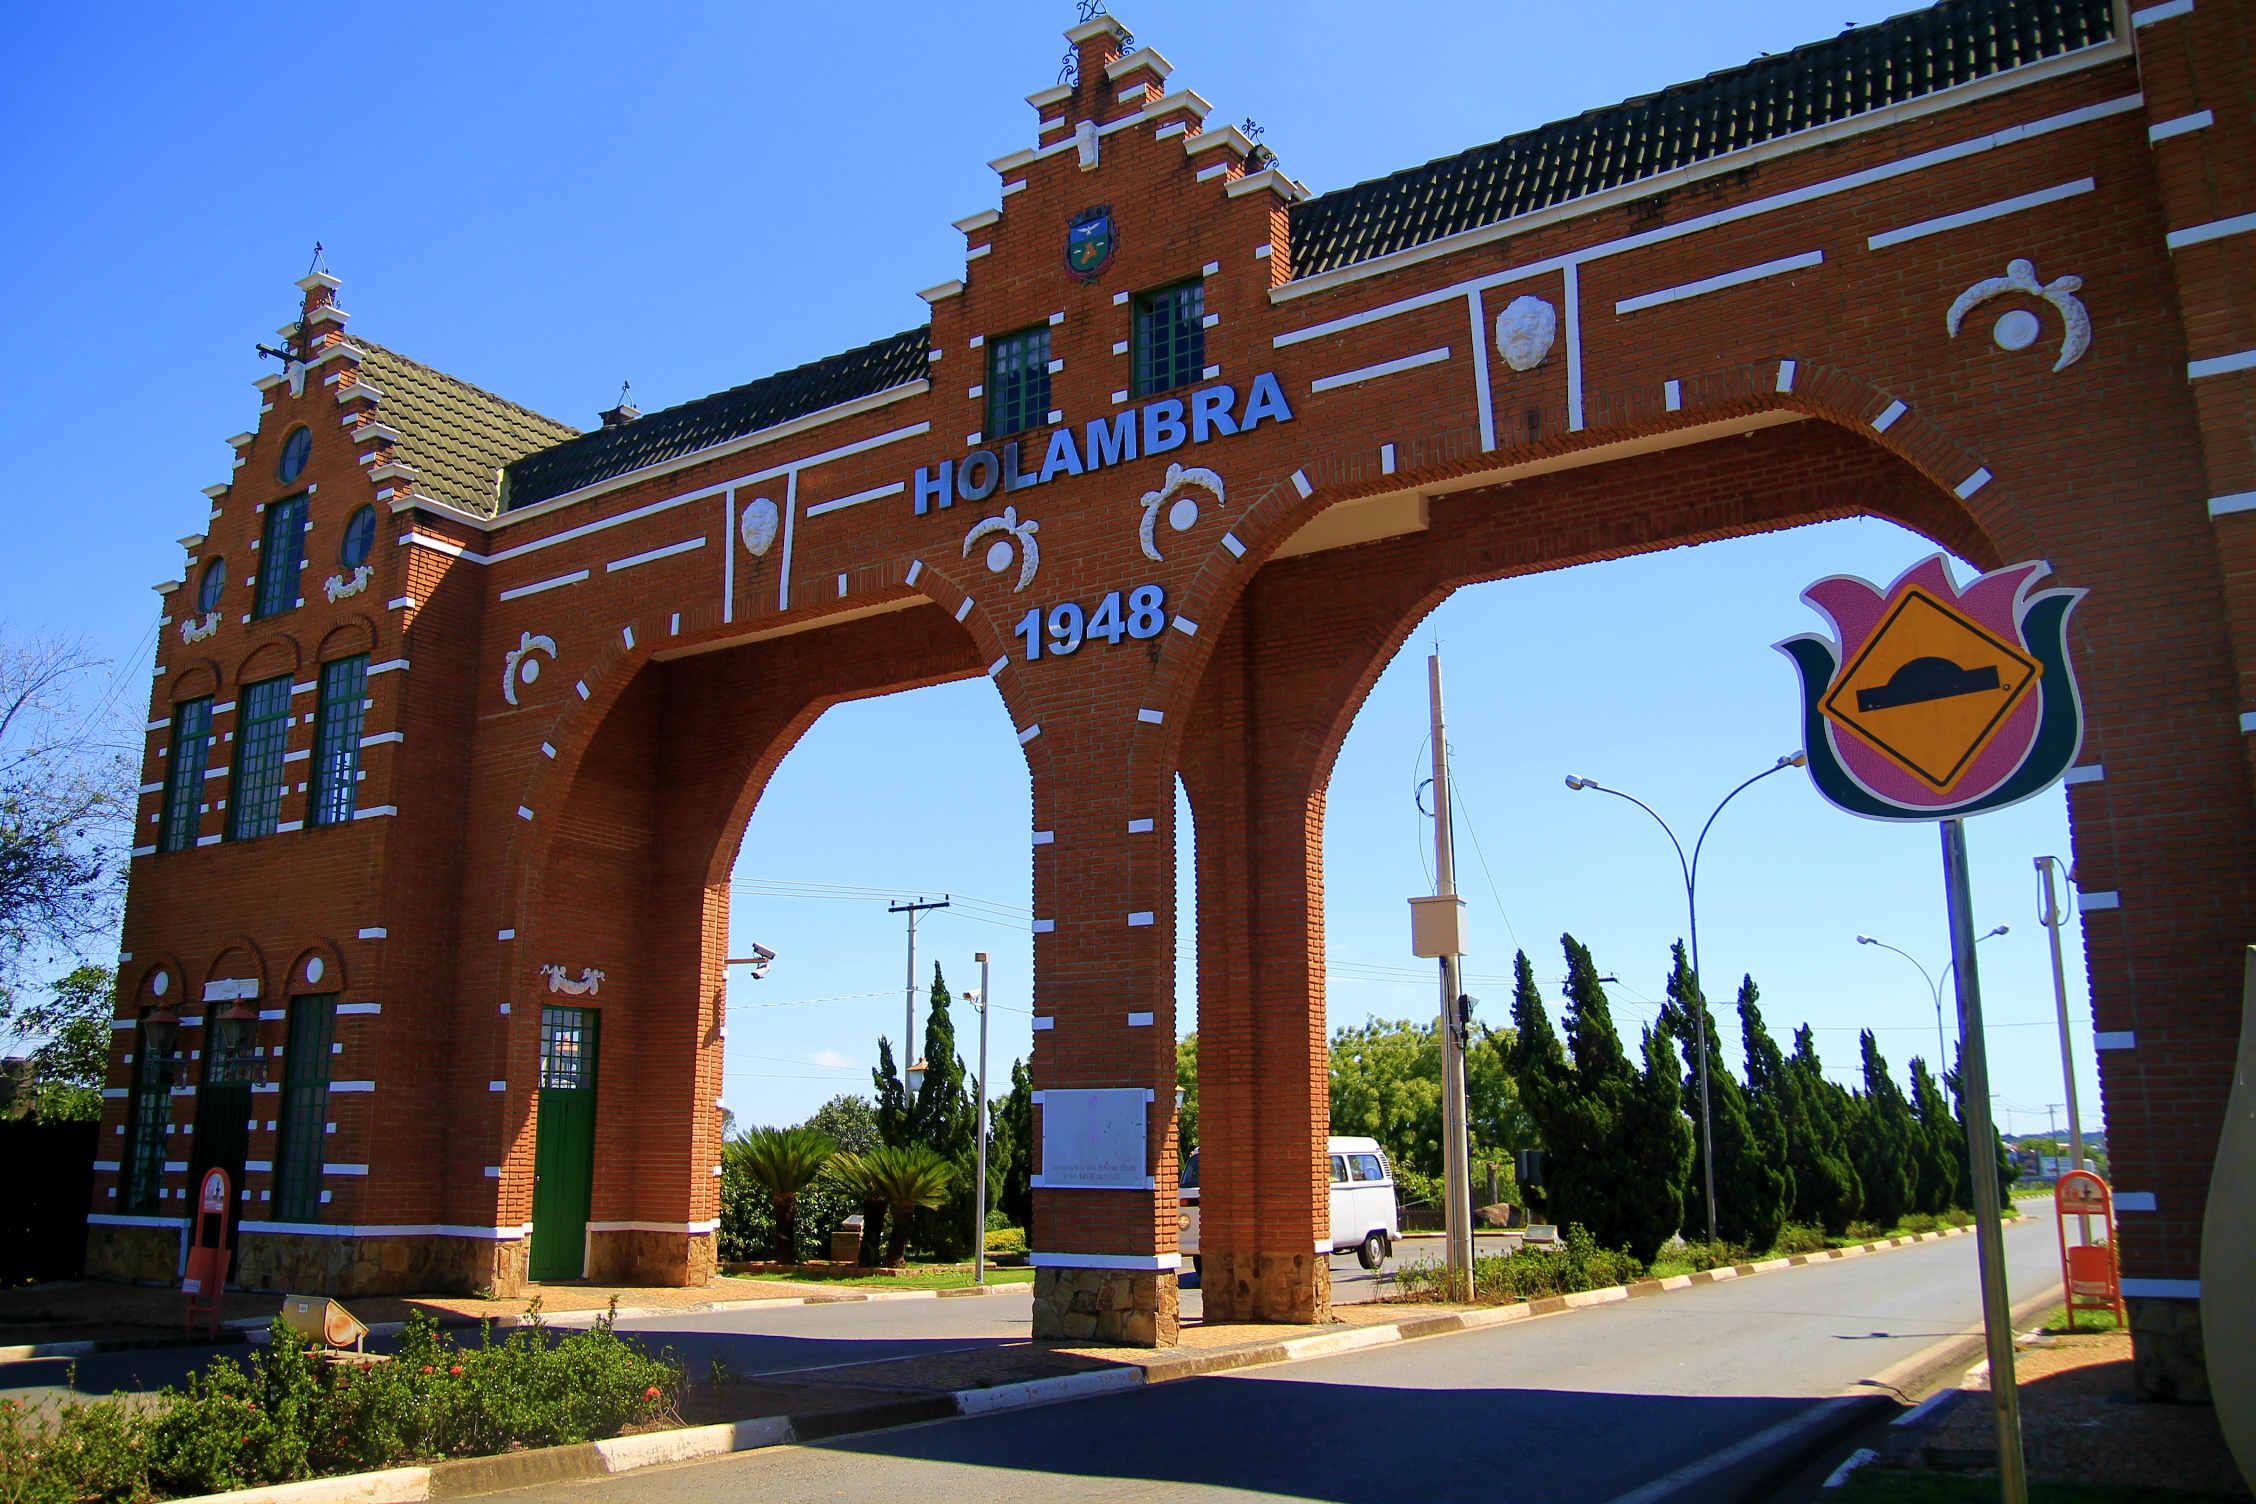 Portal de Holambra, cidade que se tornou colônia holandesa após a Segunda Guerra Mundial (Foto: Thaís Sabino)